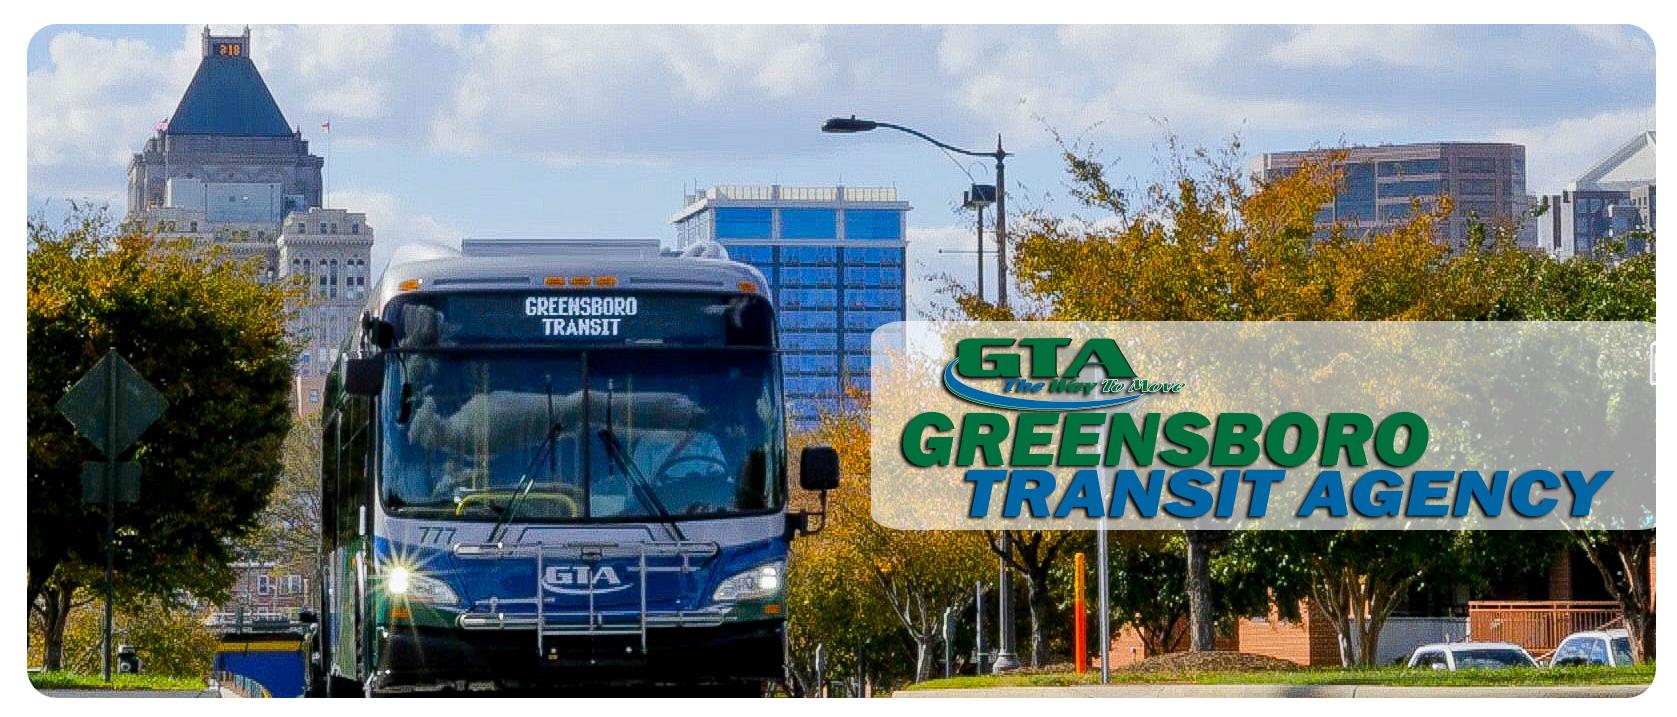 Public Transportation/GTA | Greensboro, NC